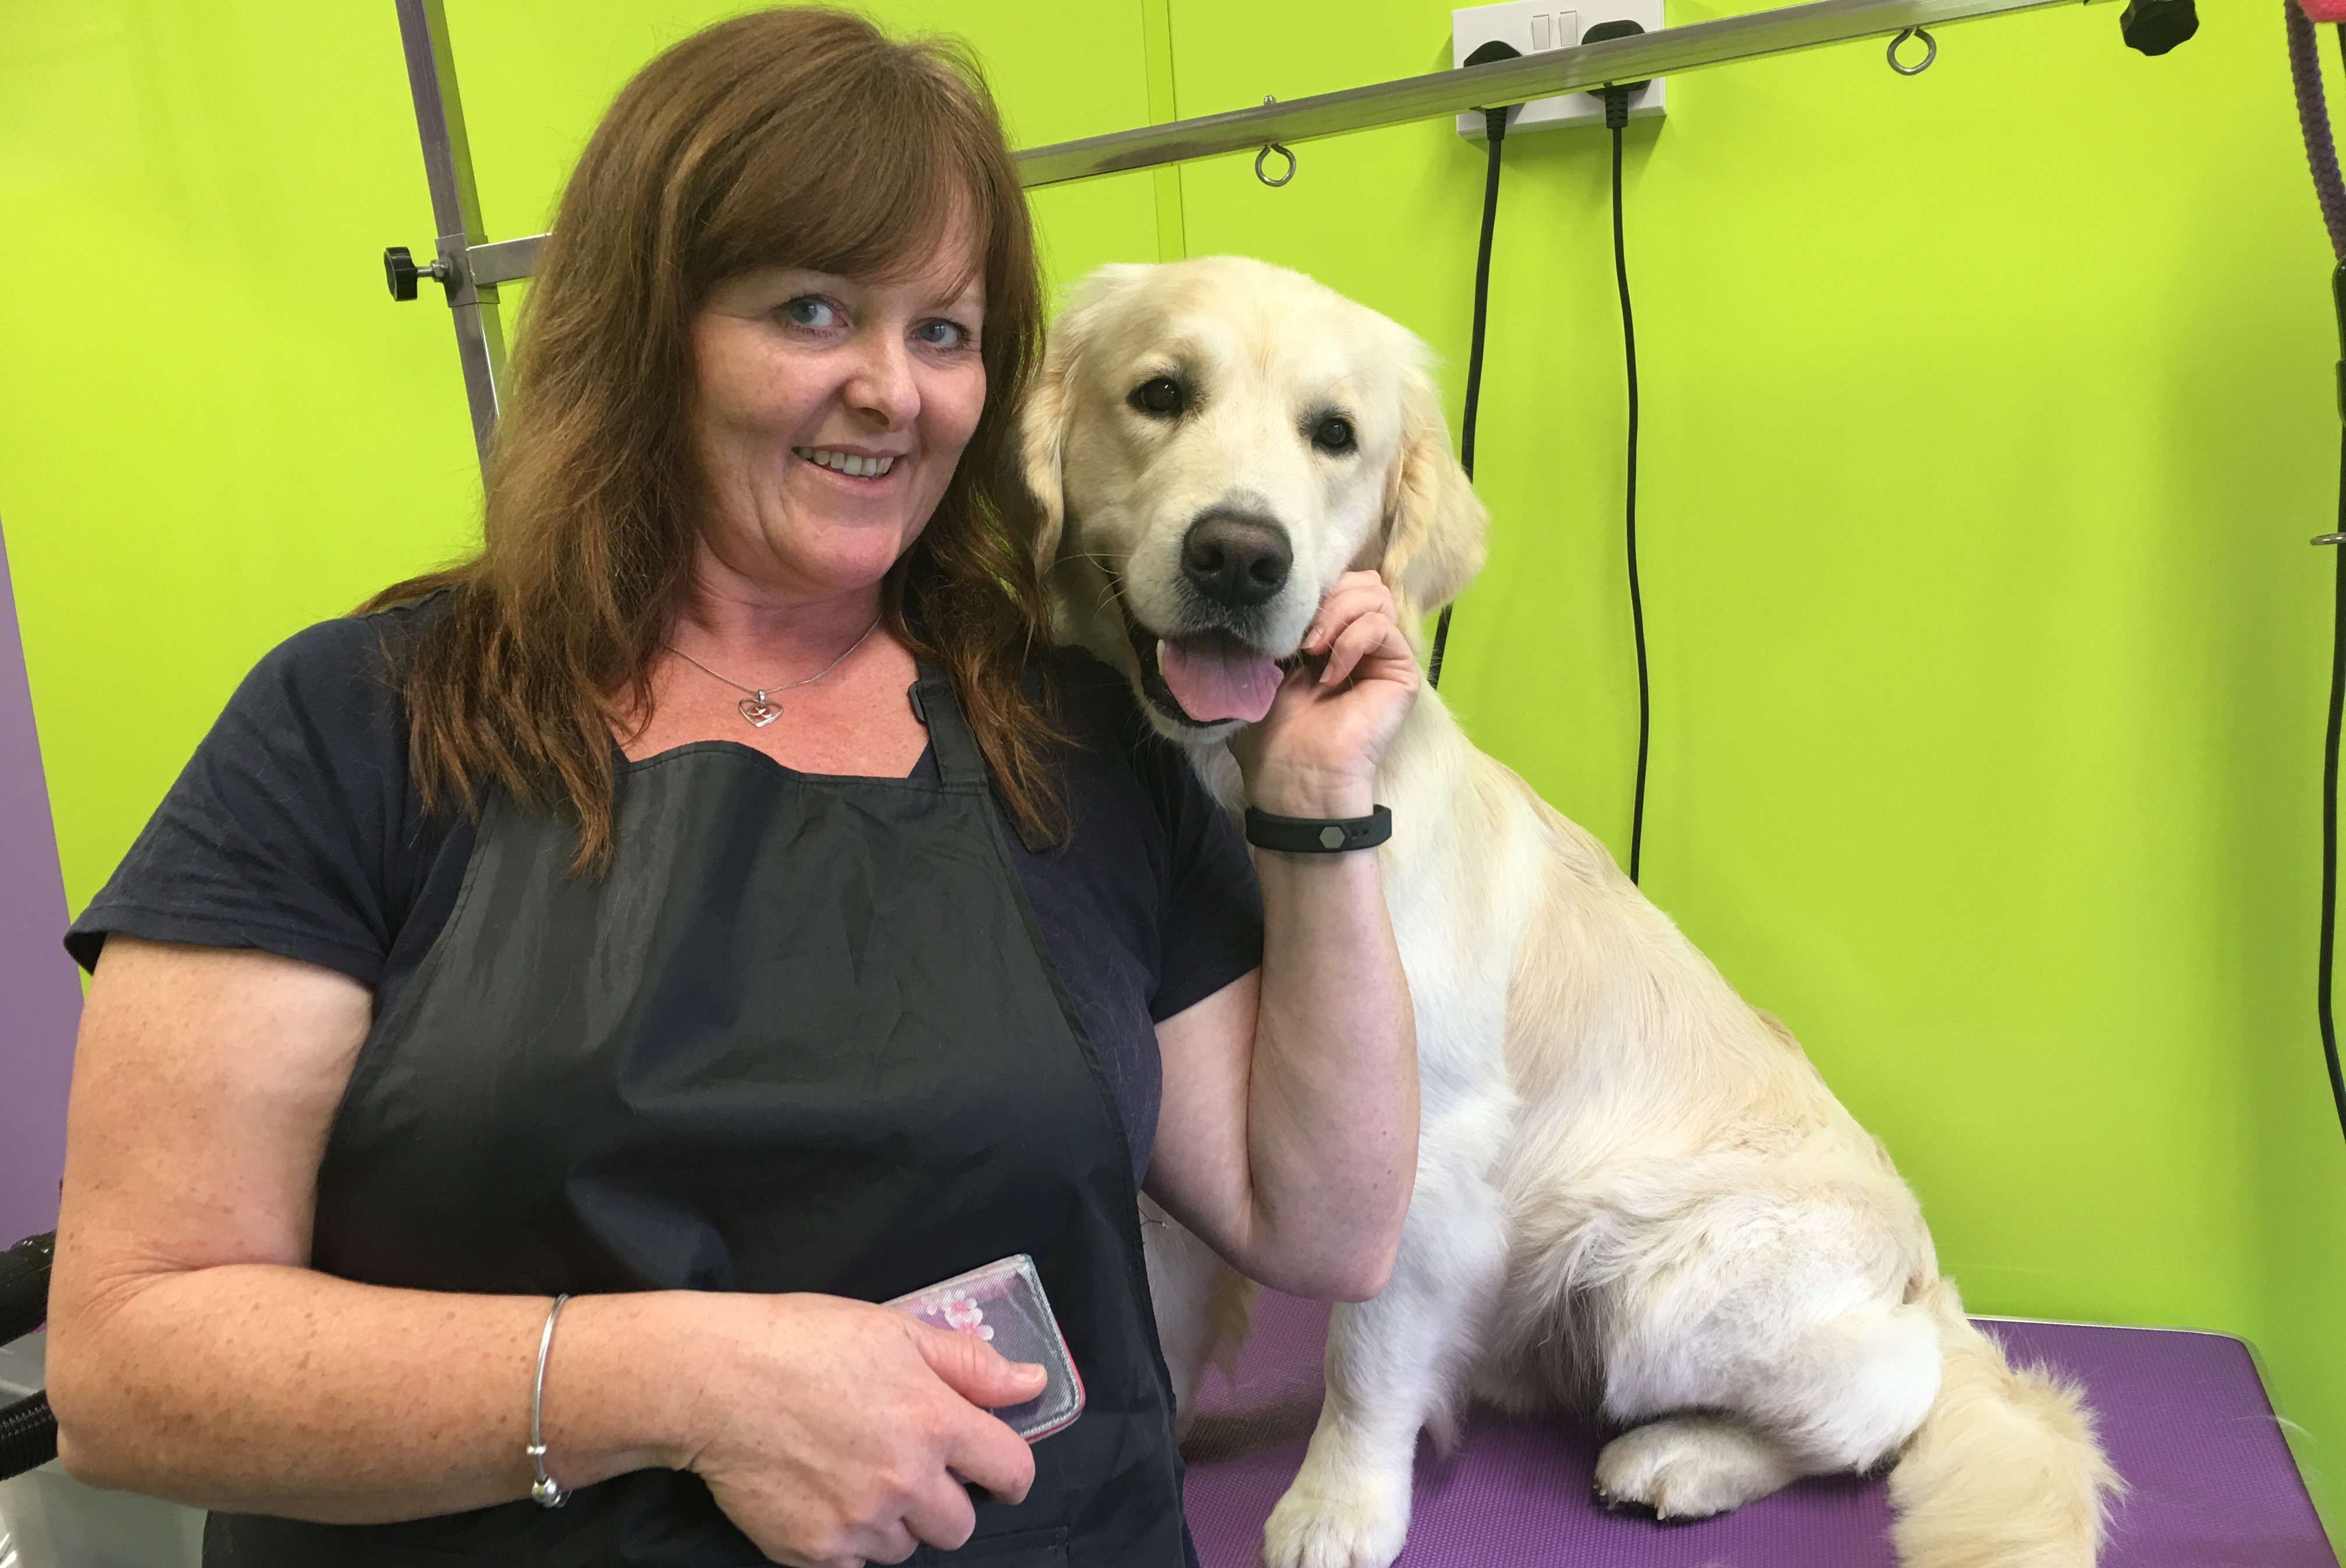 Dog Grooming Franchise